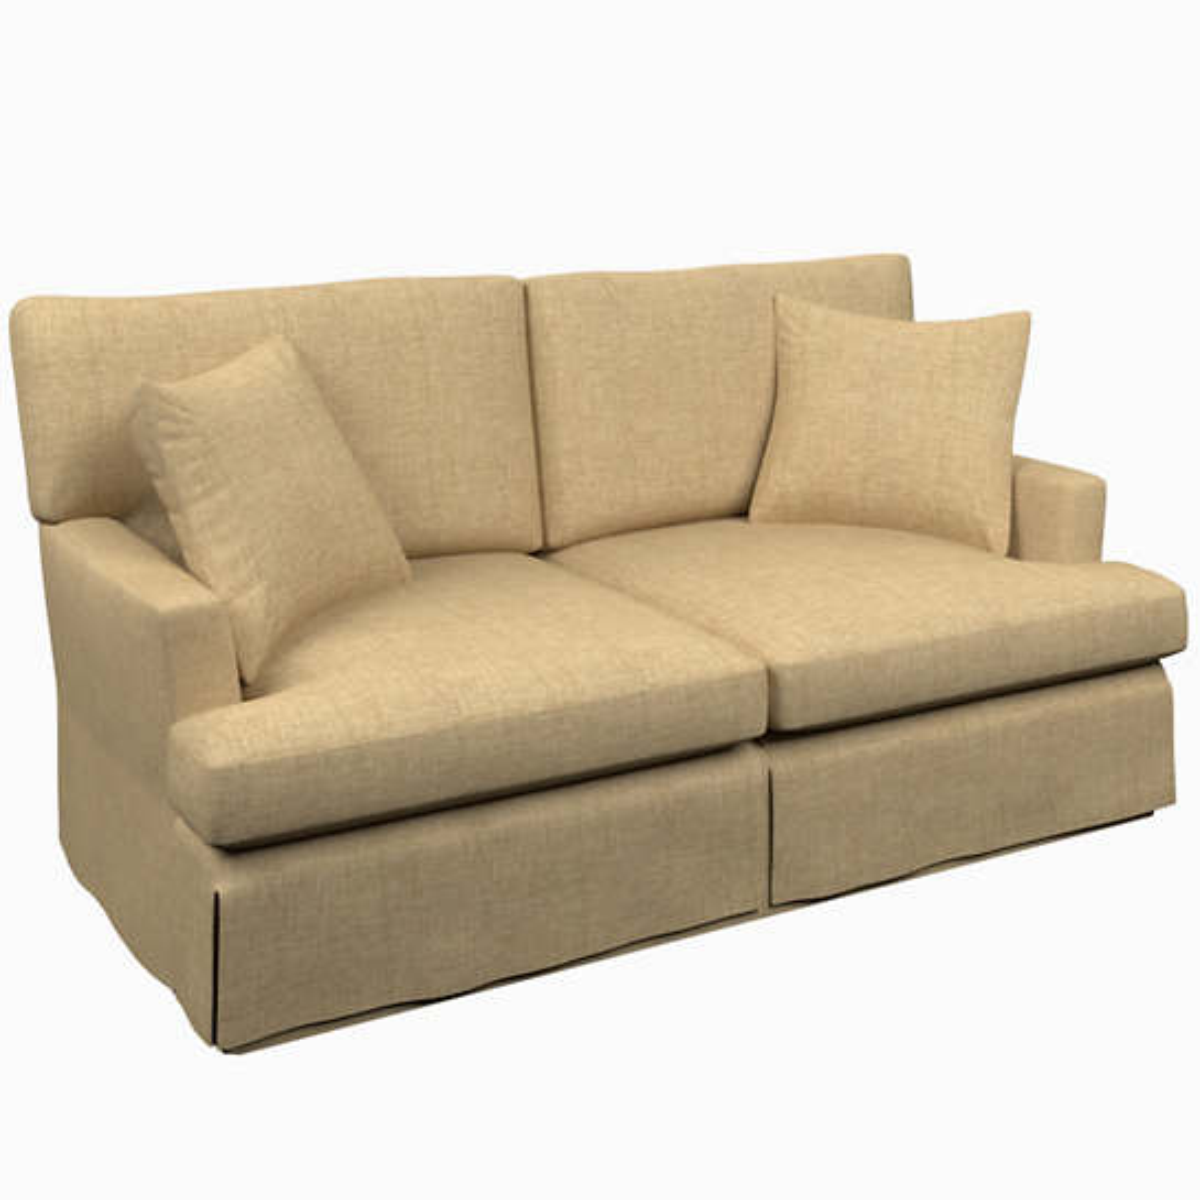 Greylock Natural Saybrook 2 Seater Slipcovered Sofa